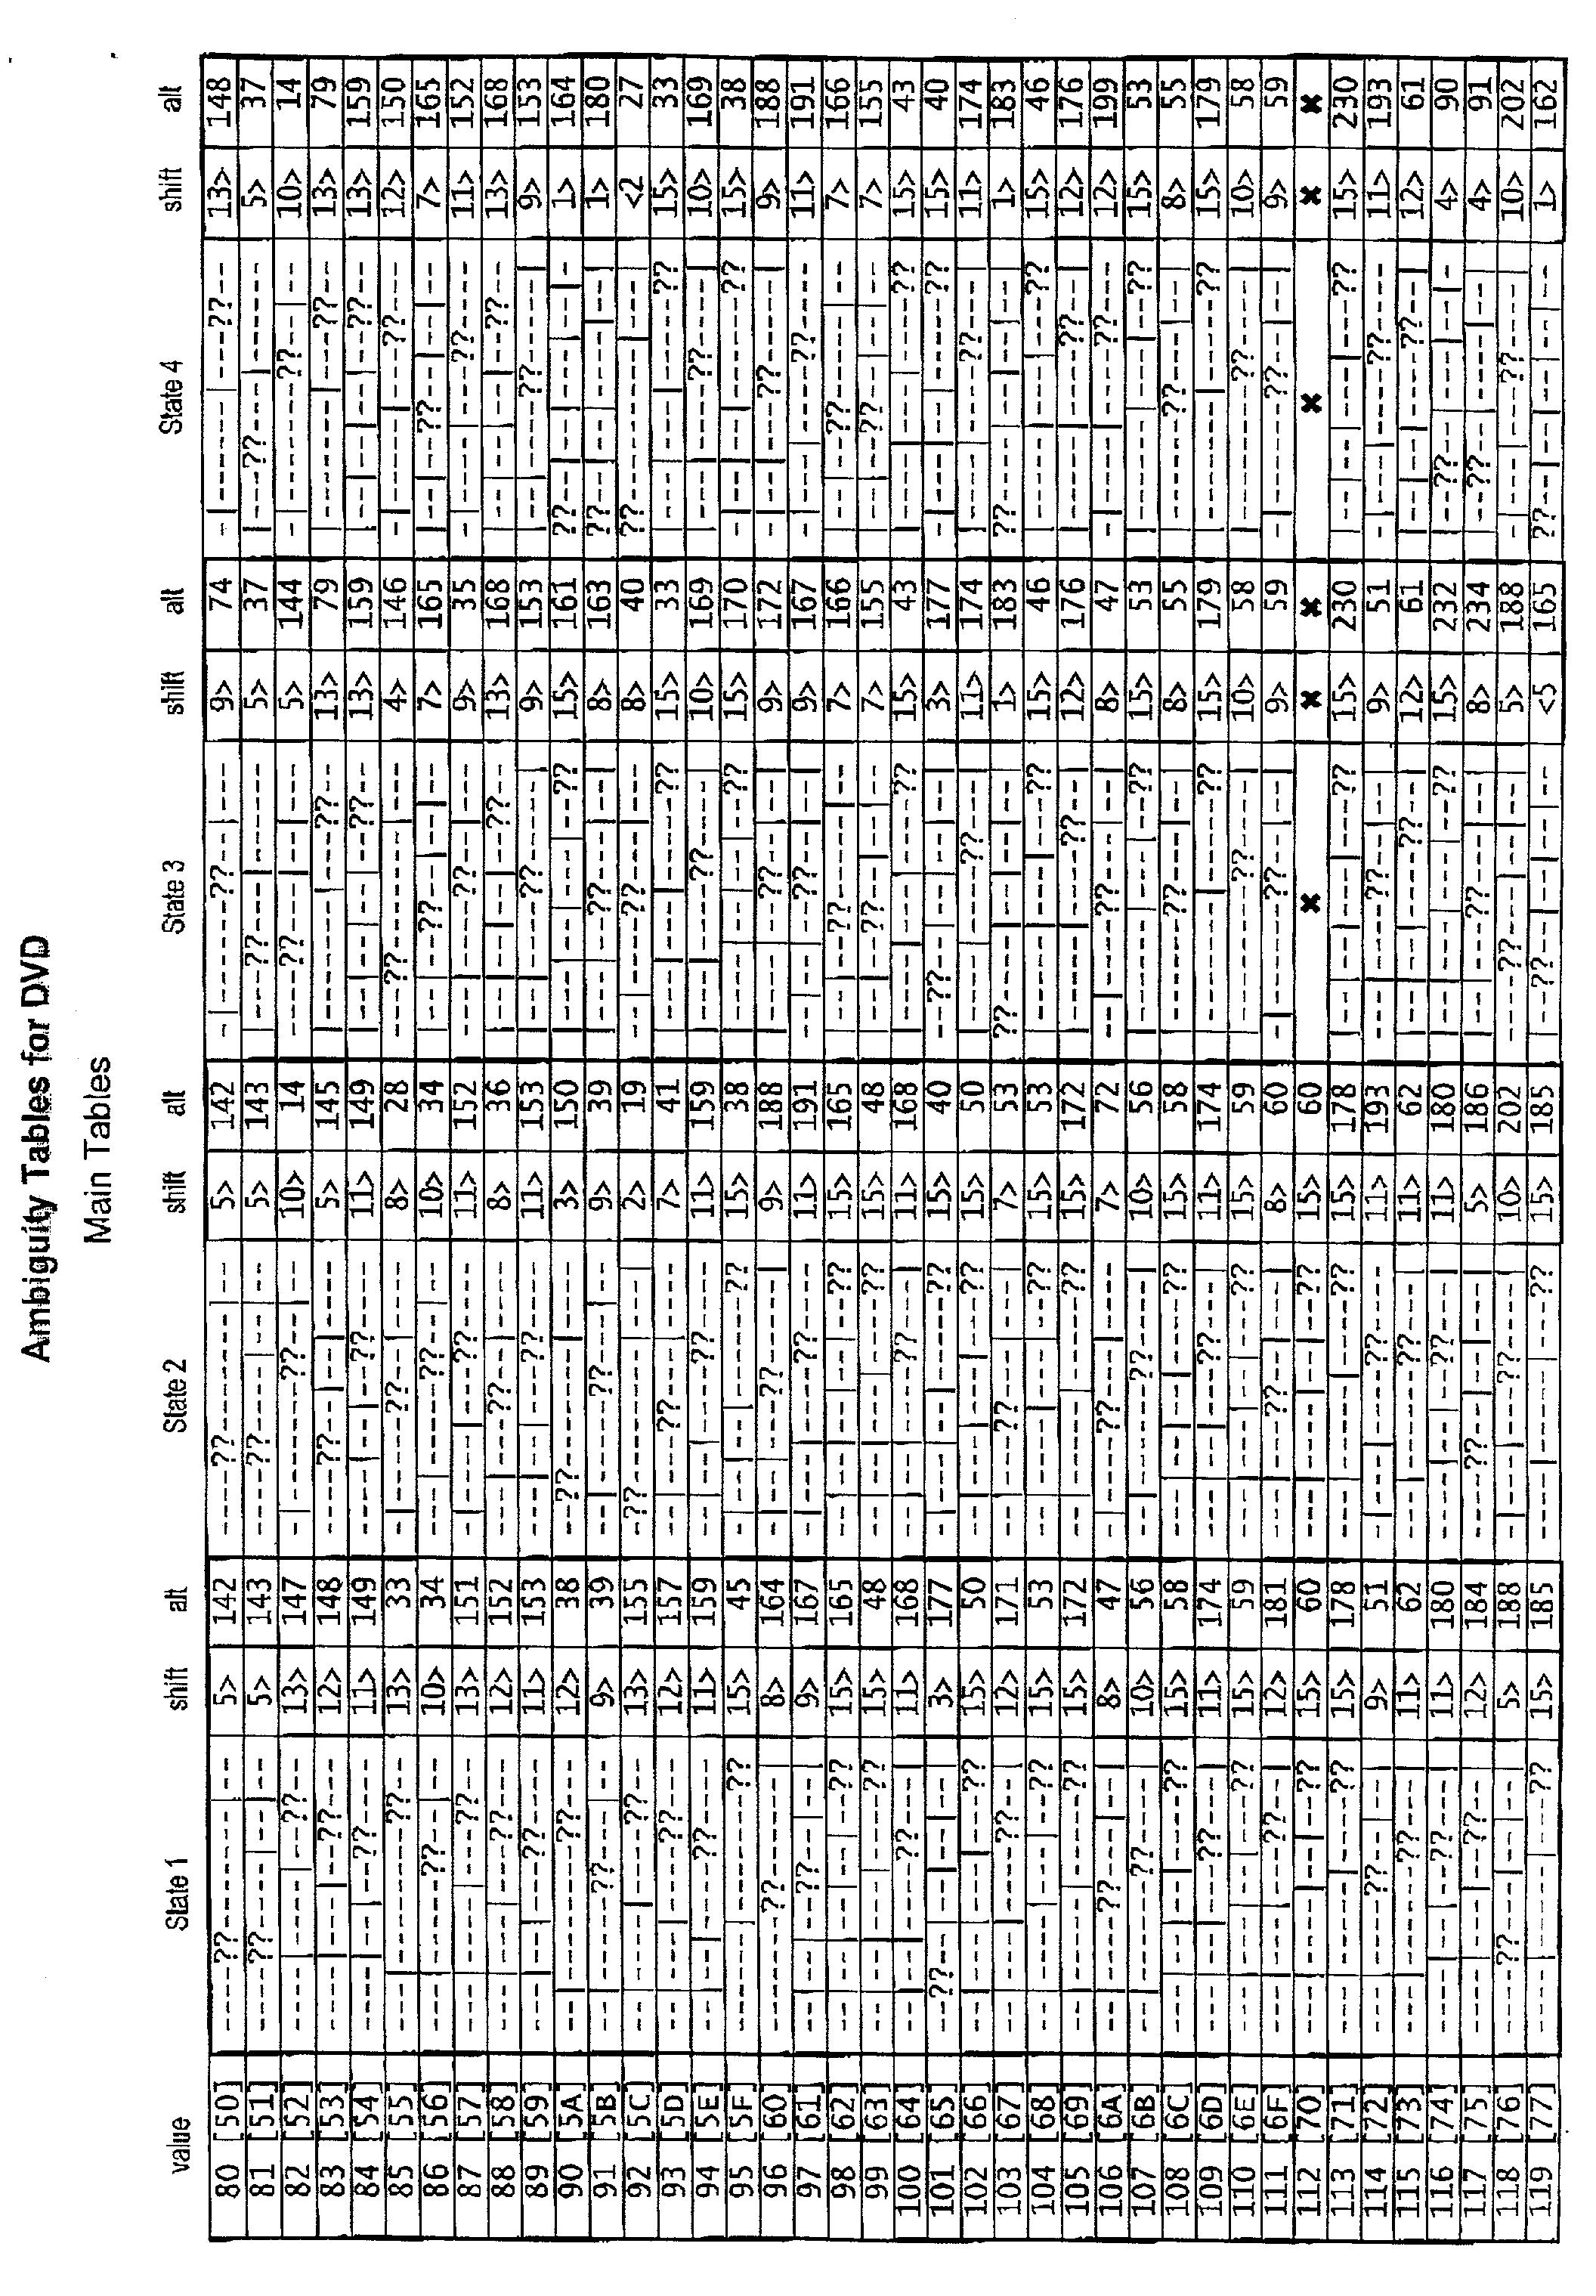 Figure US20020069389A1-20020606-P00004